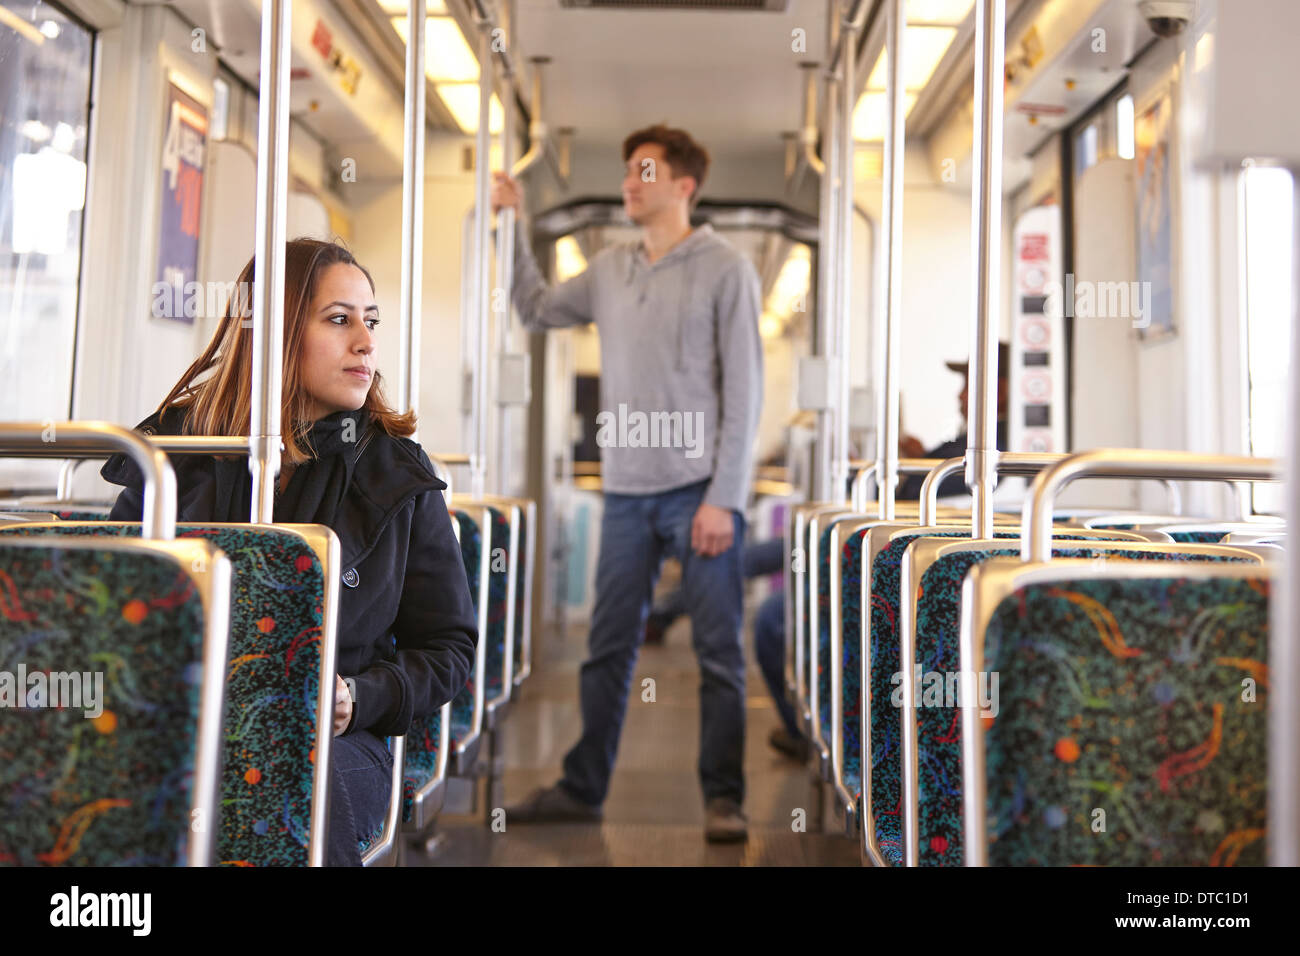 Commuters on empty subway train - Stock Image